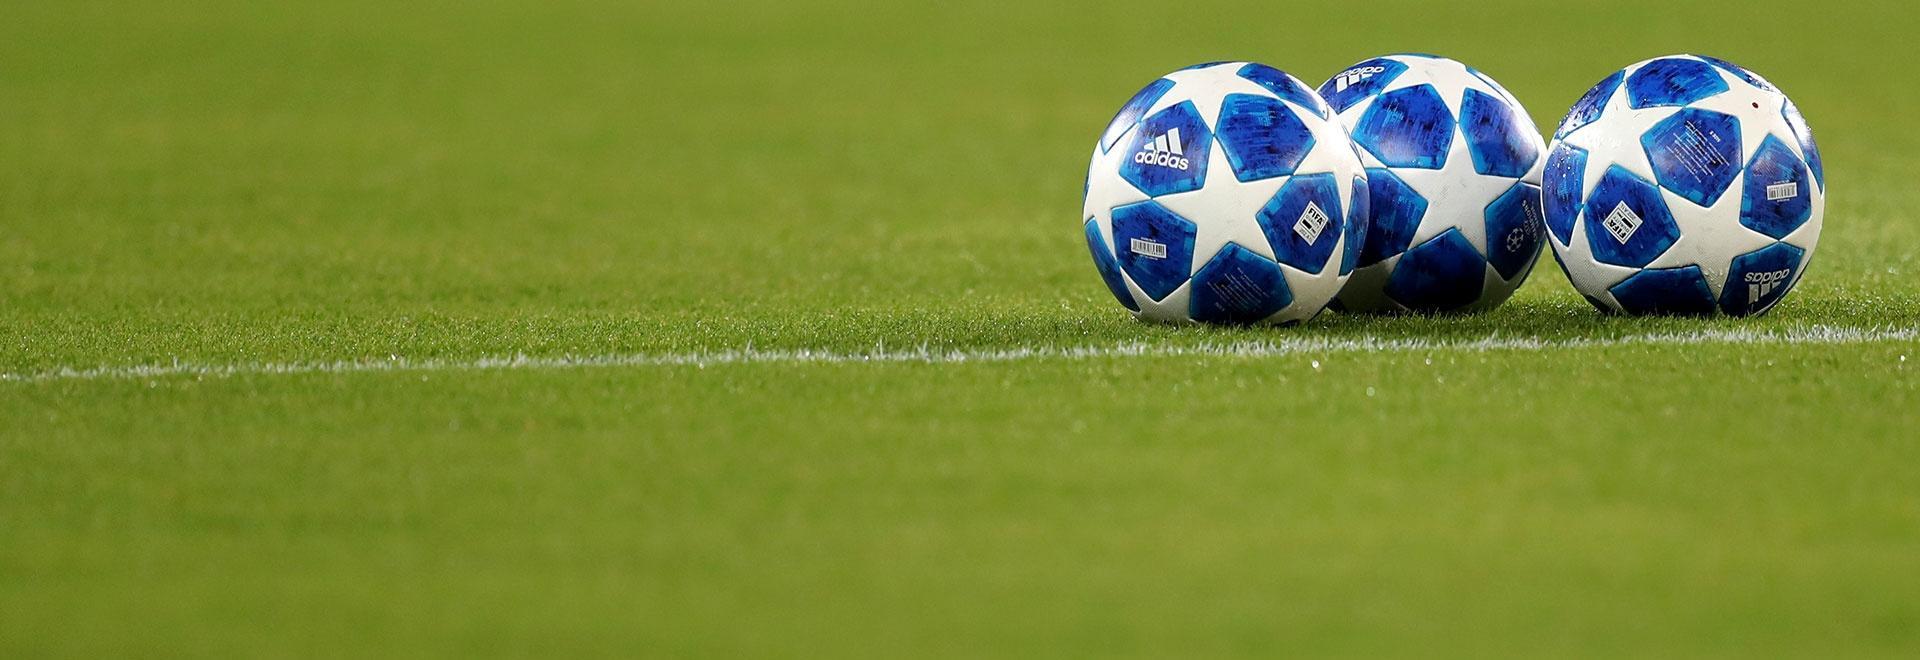 Borussia D. - Arsenal 16/09/14